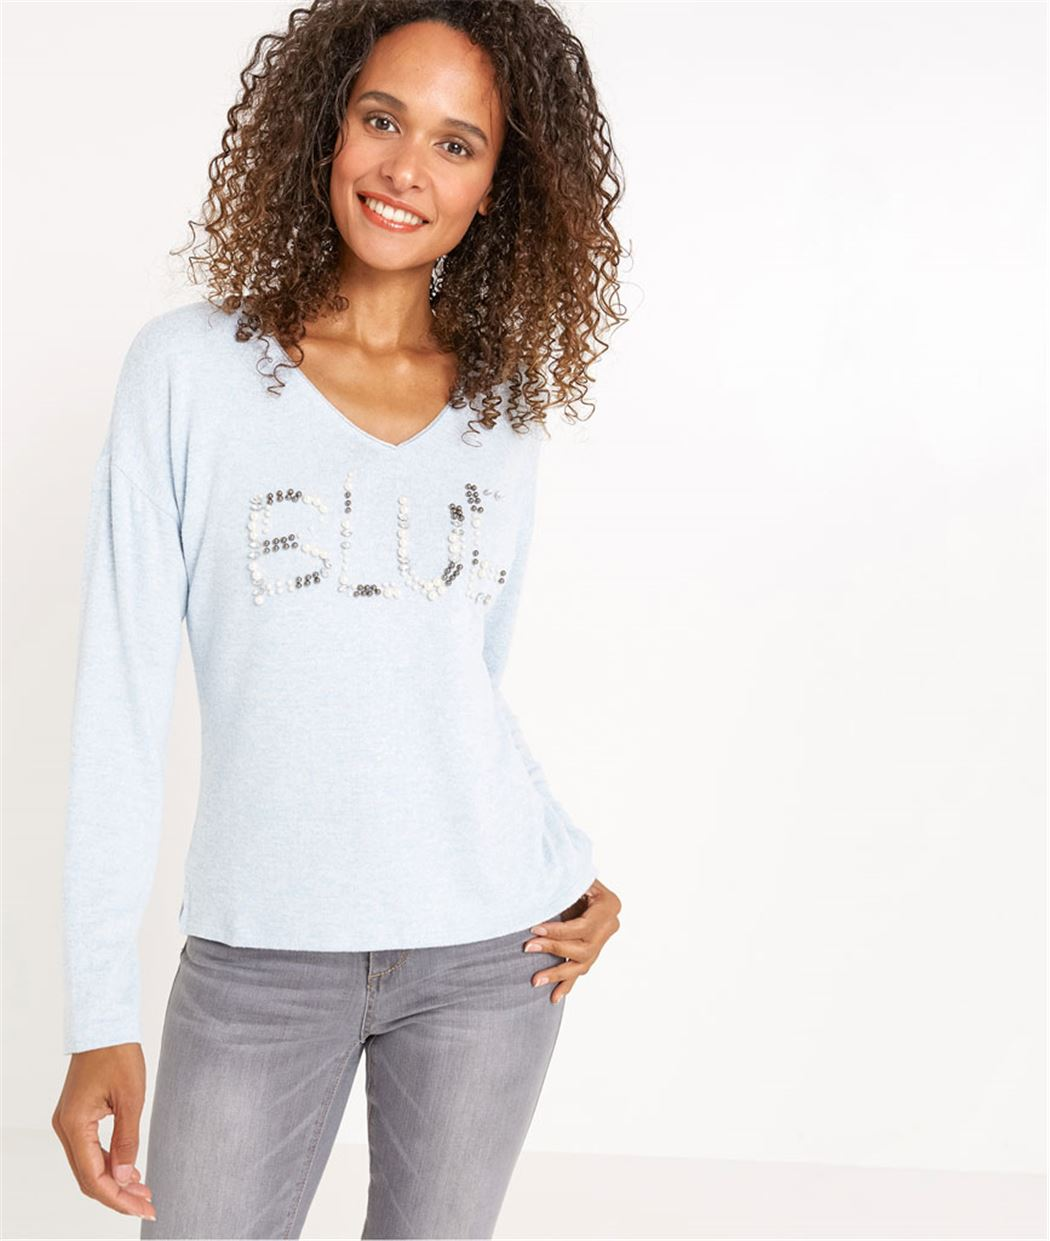 T-shirt femme manches longues bleu ciel BLEU